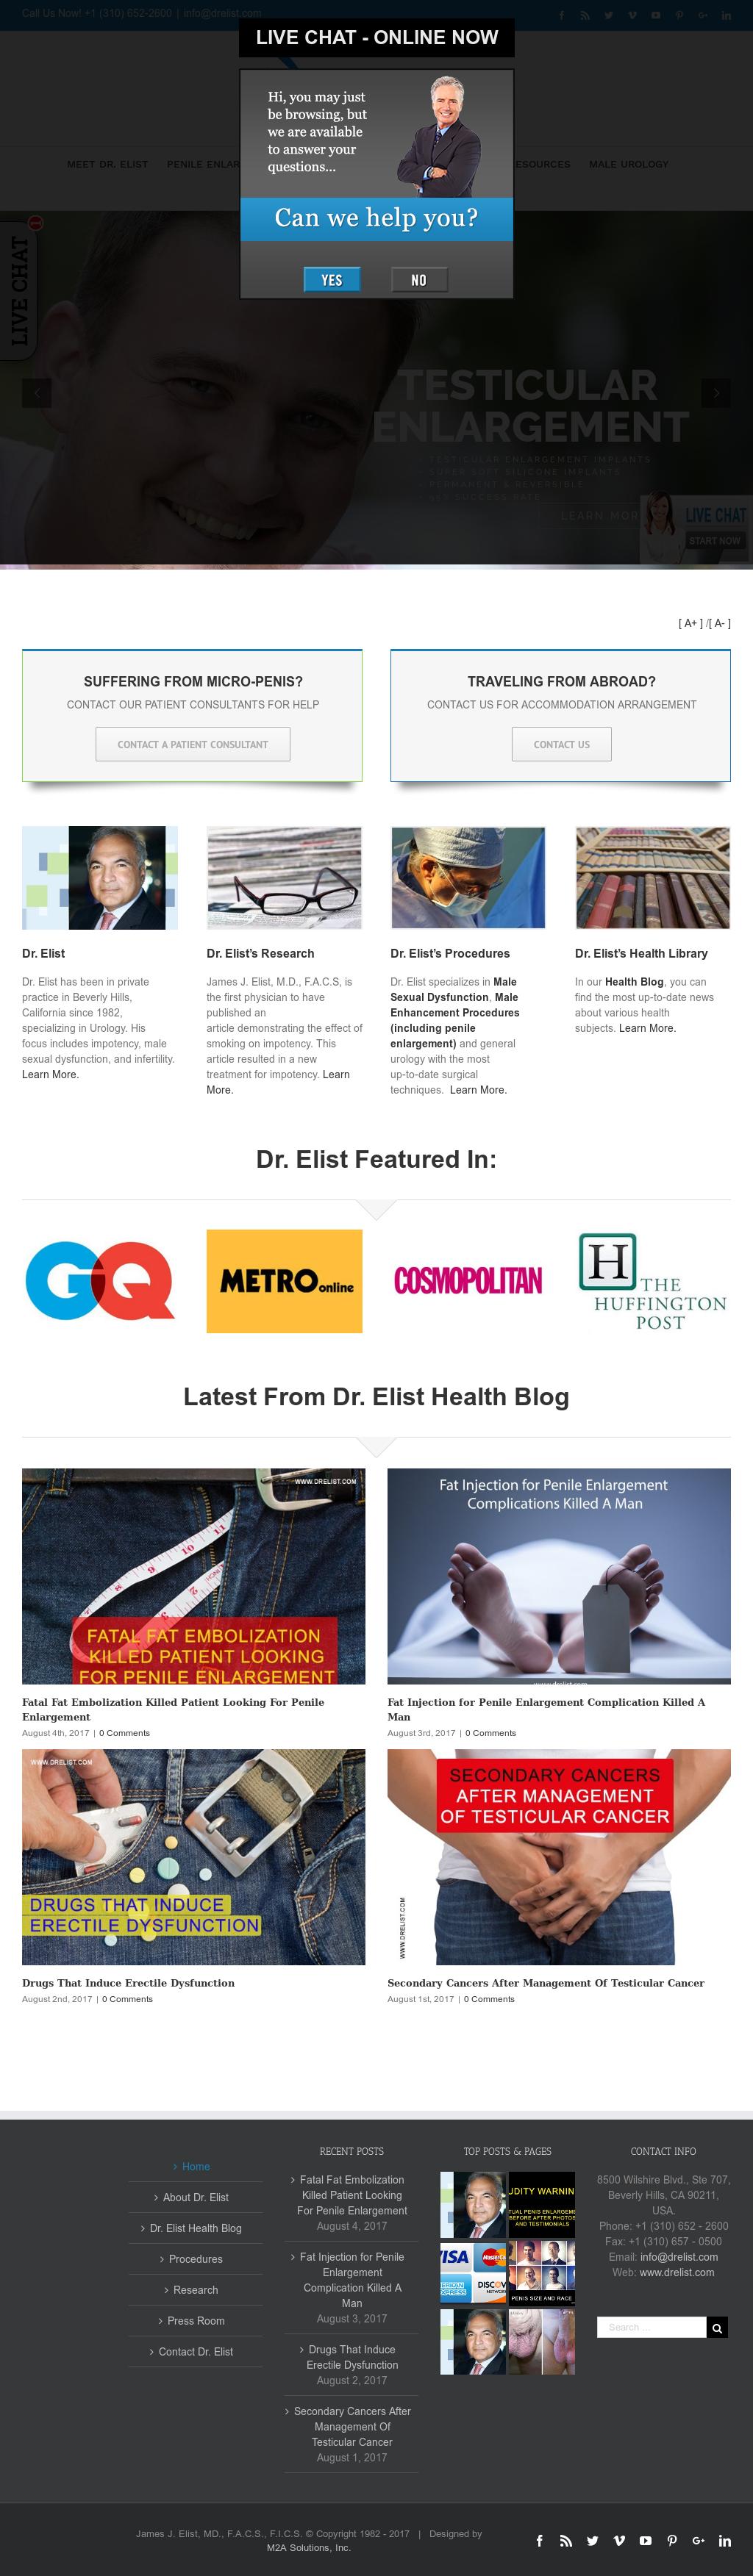 Owler Reports - Dr James Elist Blog Effective Penis